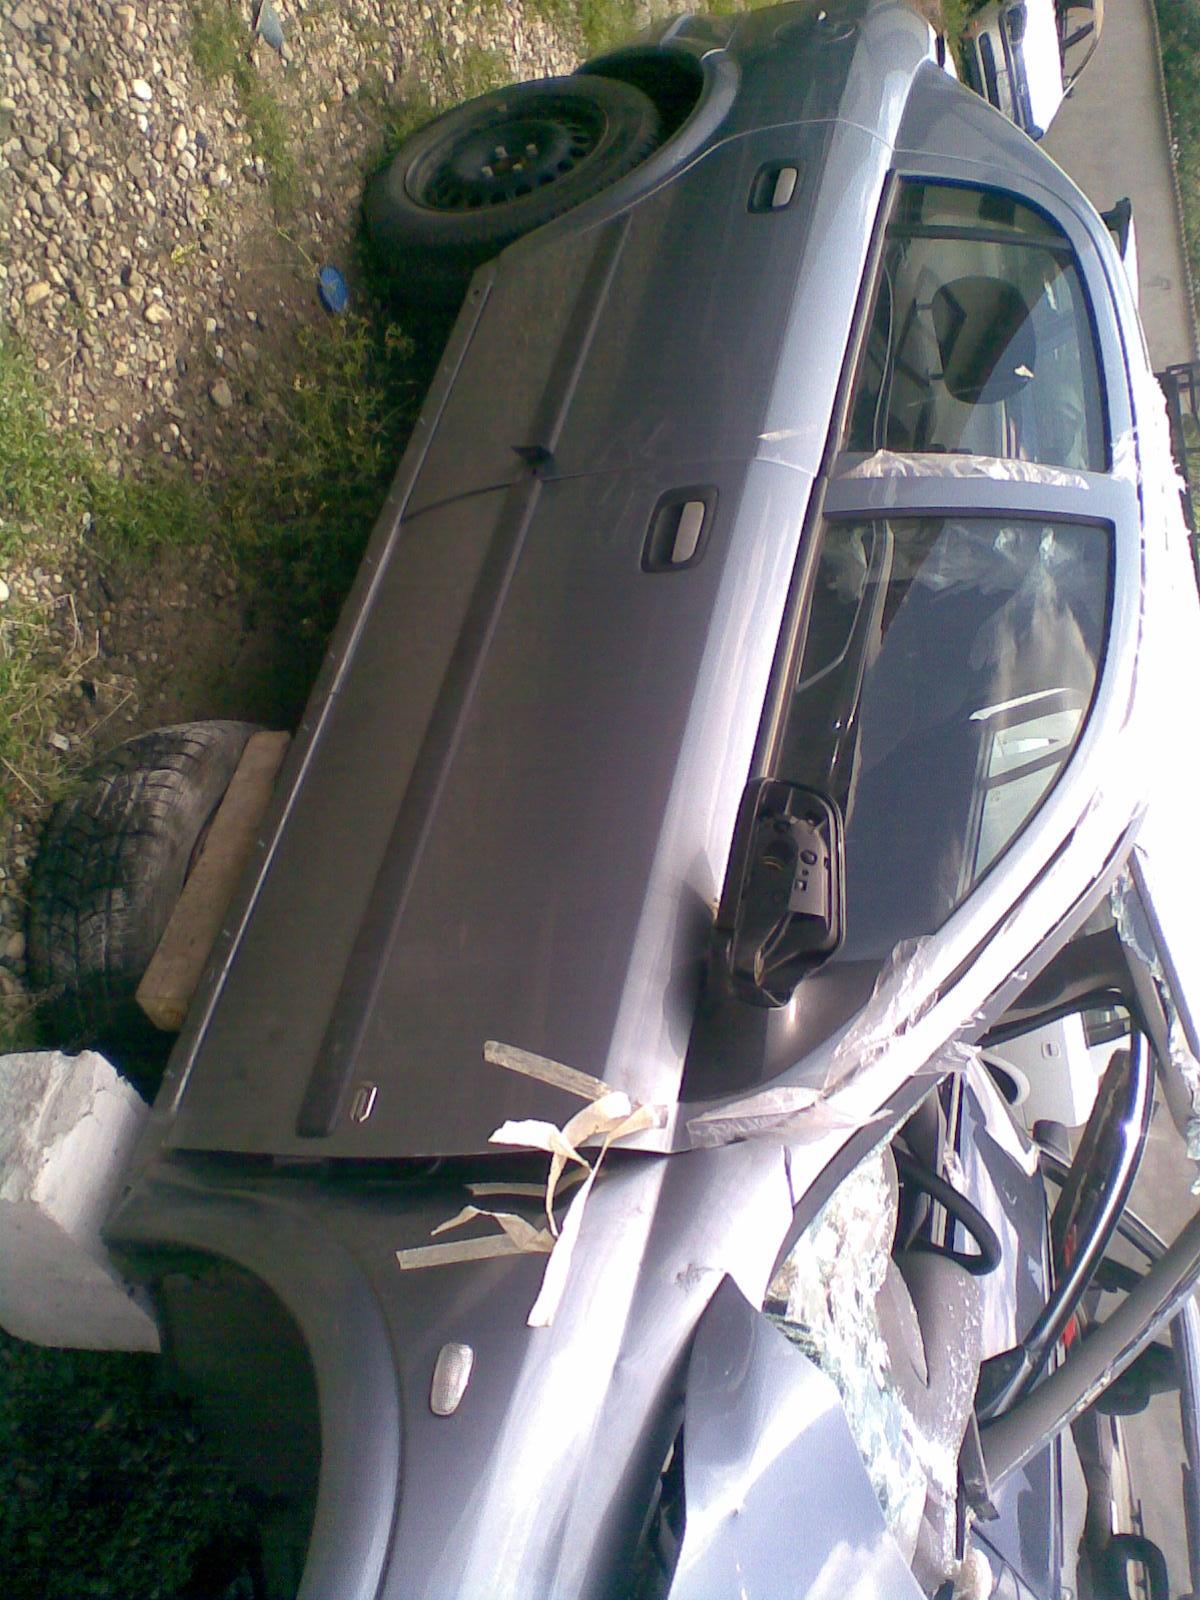 Opel Astra-G avariat 2006 Benzina Hatchback - 05 Iunie 2013 - Poza 3